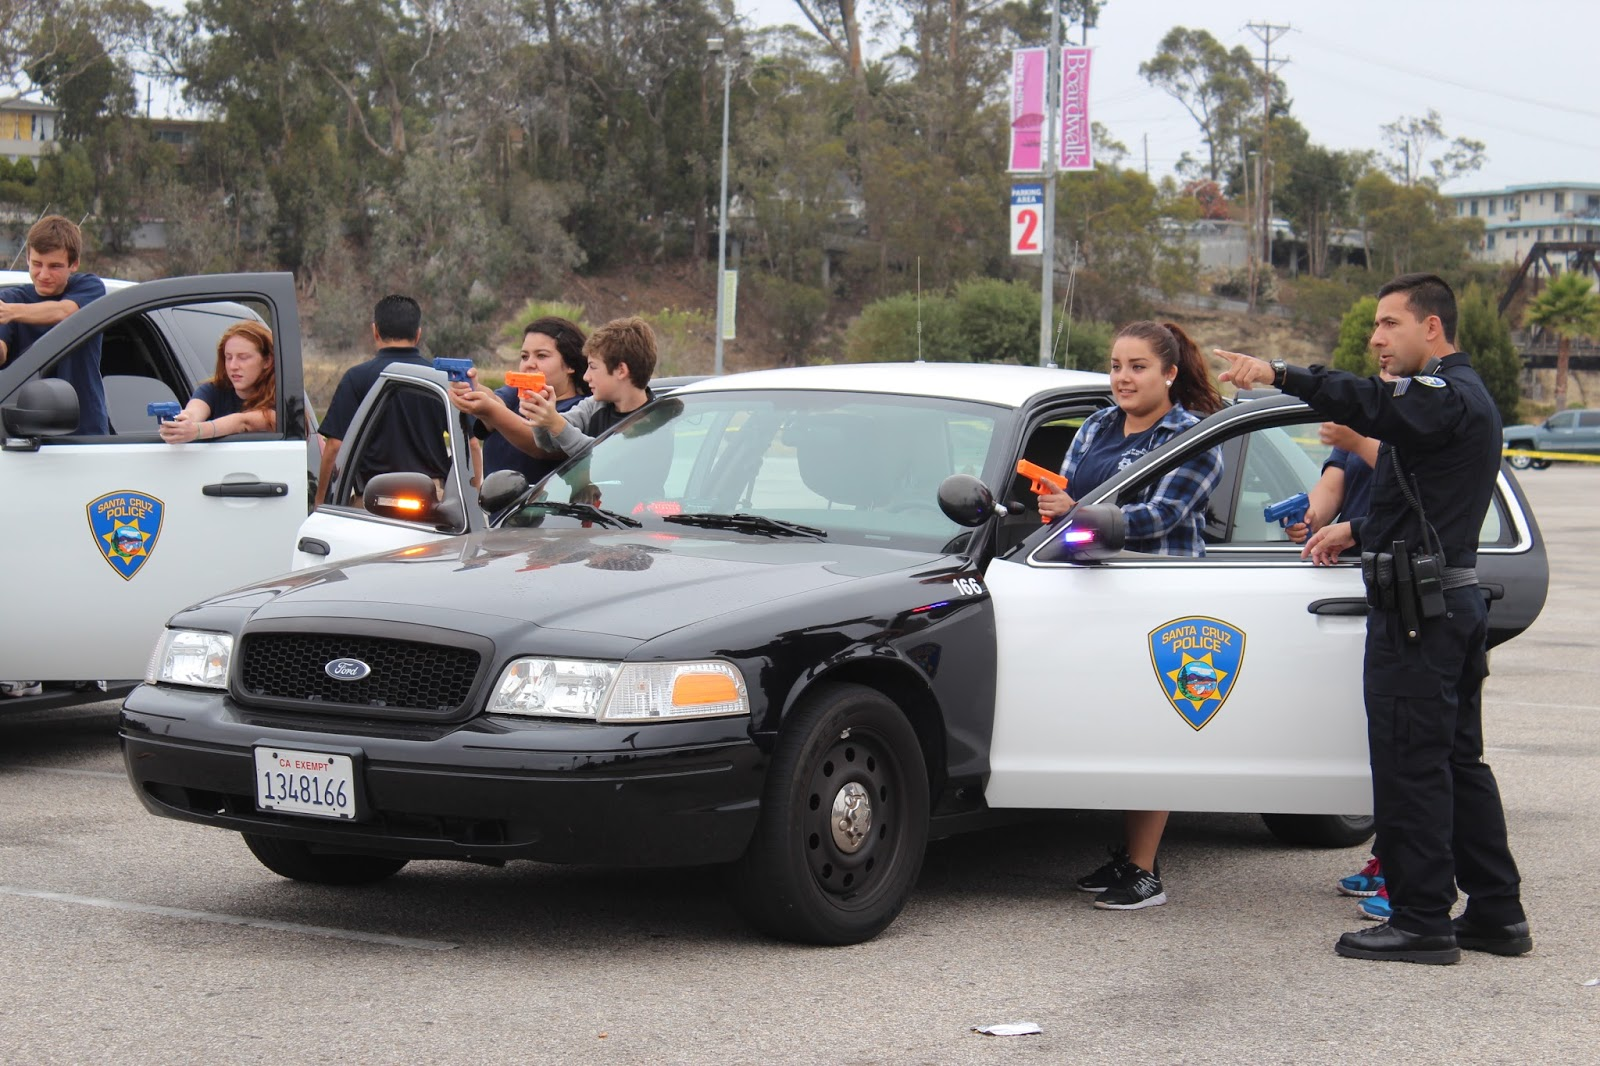 Santa Cruz Police Sign Up Now For Teen Public Safety Academy